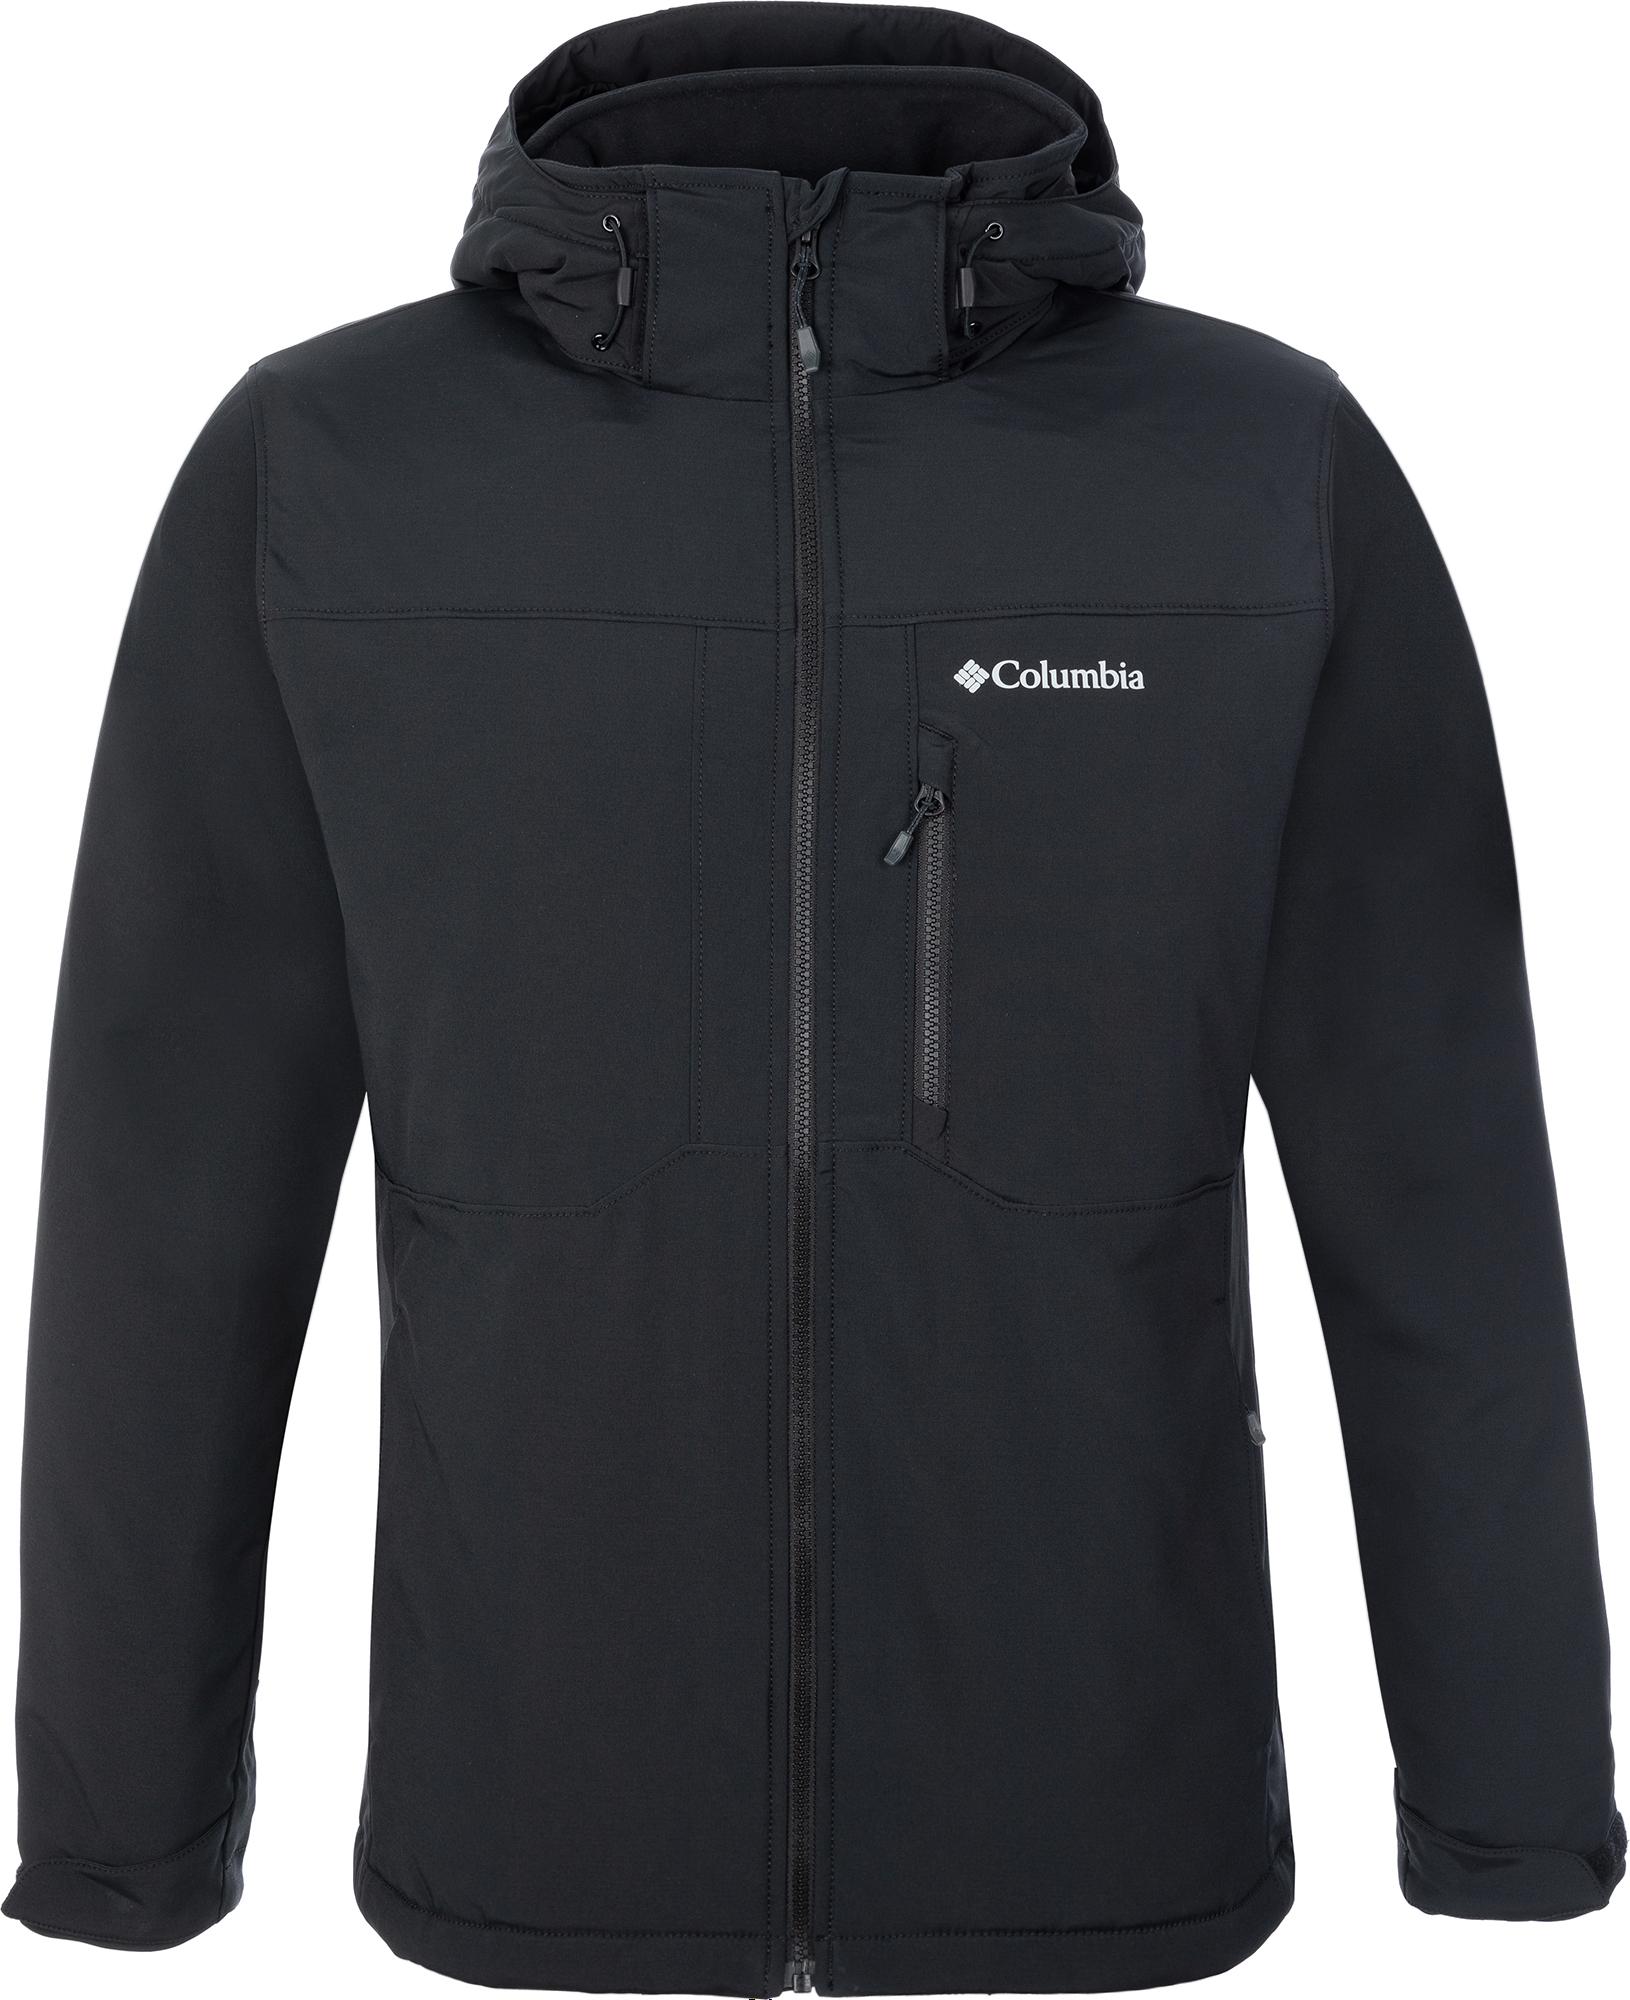 Columbia Куртка утепленная мужская Sumner Summit, размер 56-58